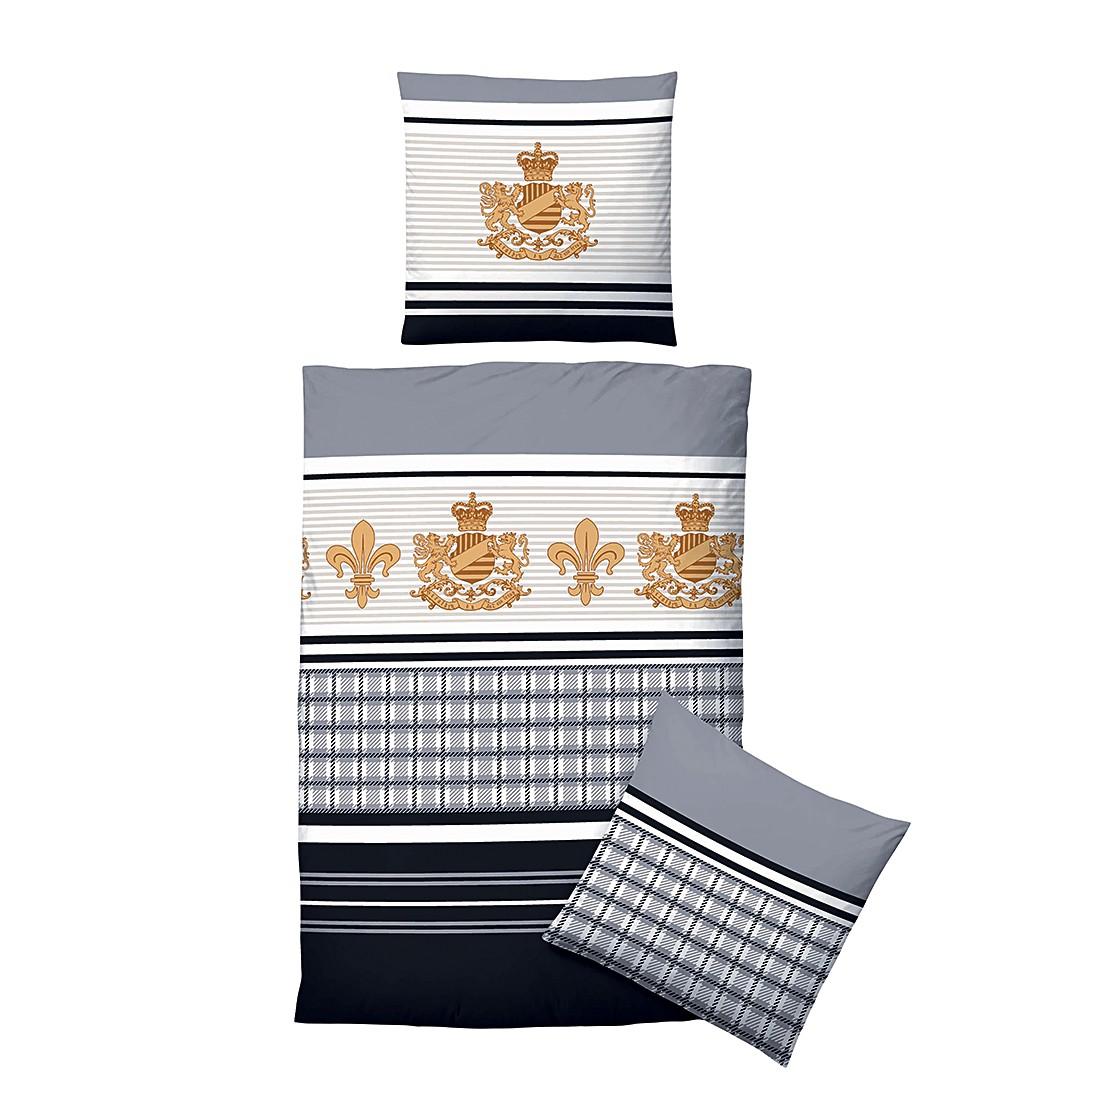 Komfort-Biber-Bettwäsche Susann – Schwarz – 135 x 200 cm + Kissen 80 x 80 cm, Biberna günstig bestellen